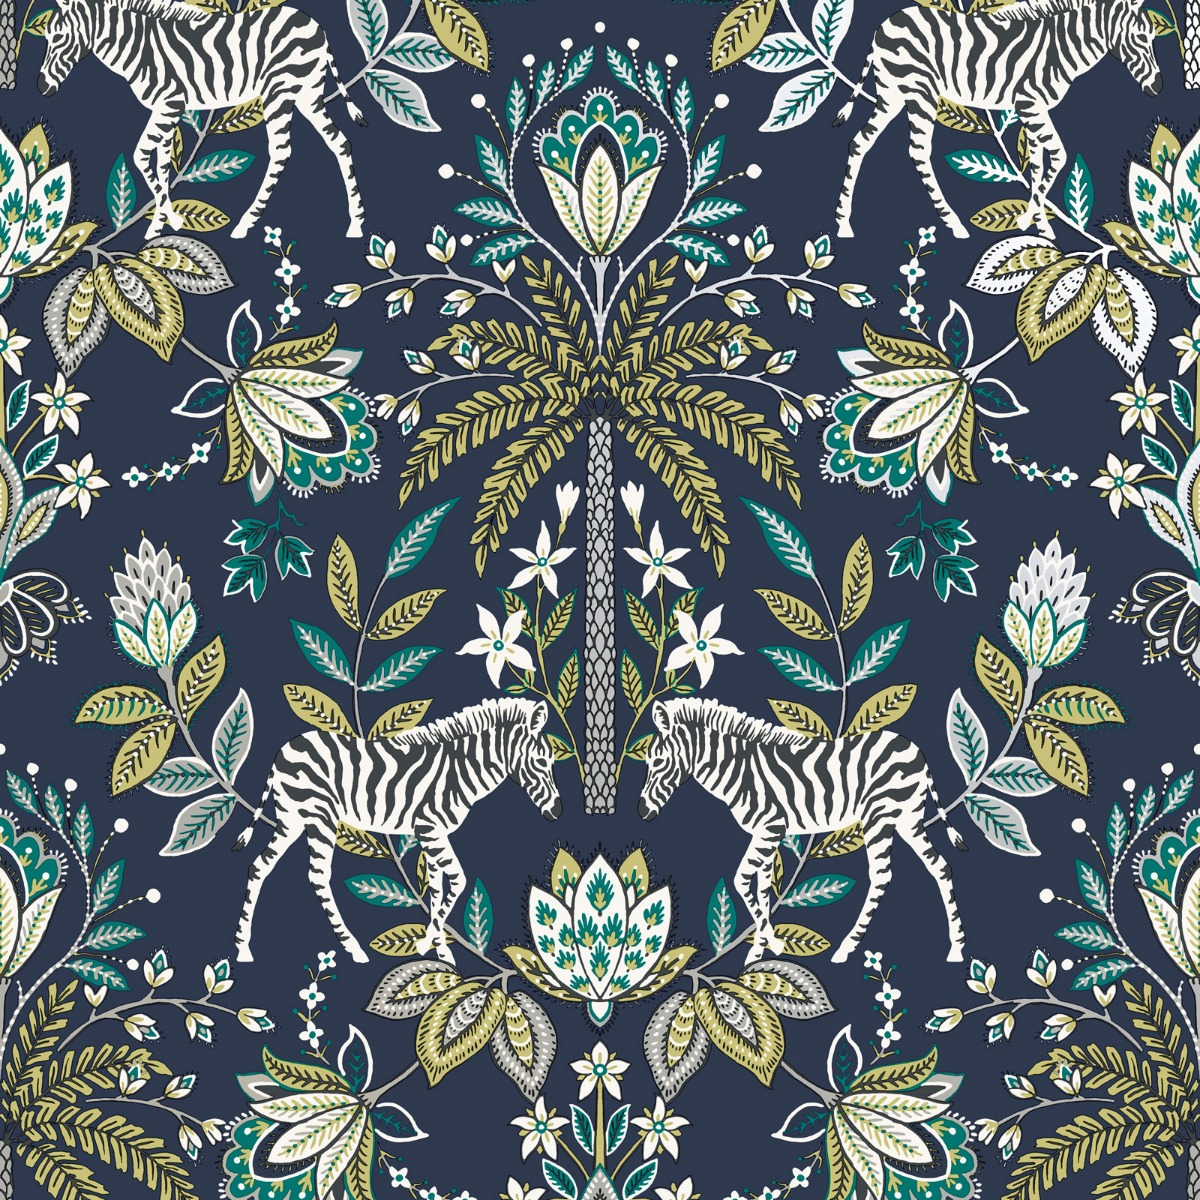 Holden Zebra Safari Wallpaper Floral Tree Metallic Navy Ochre Teal Charcoal